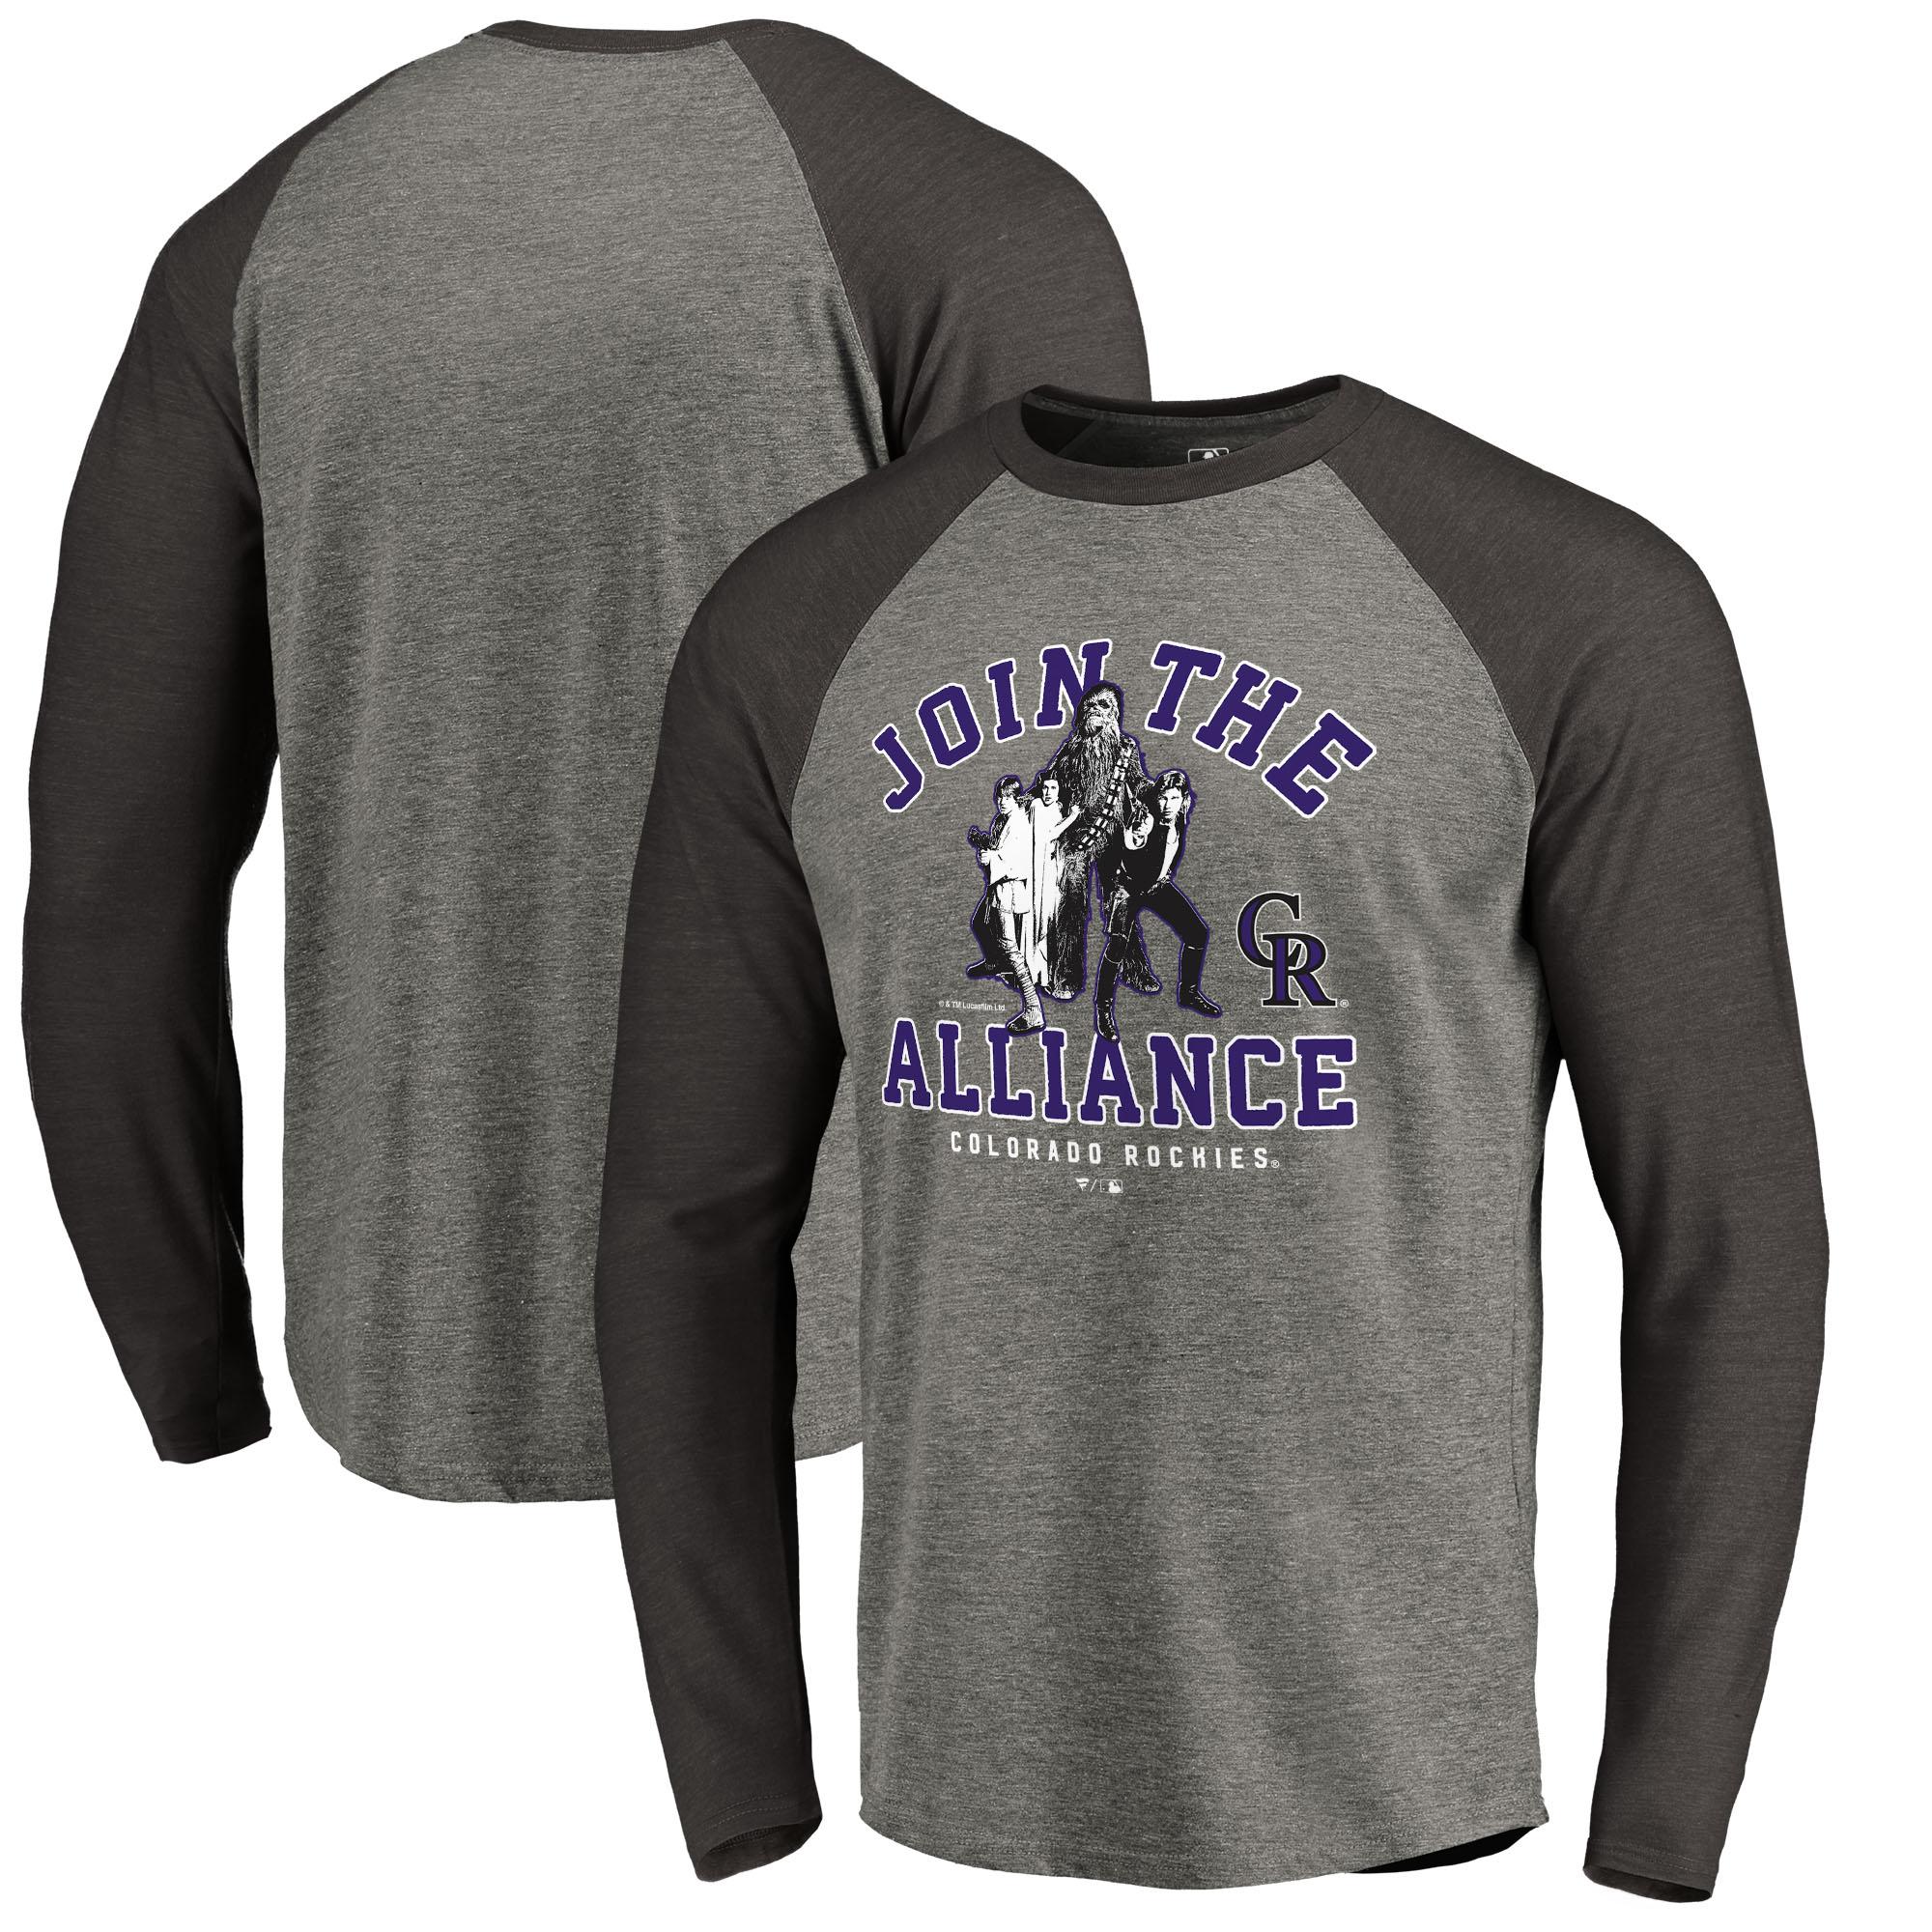 Colorado Rockies Fanatics Branded MLB Star Wars Join The Alliance Raglan Long Sleeve T-Shirt - Heather Gray